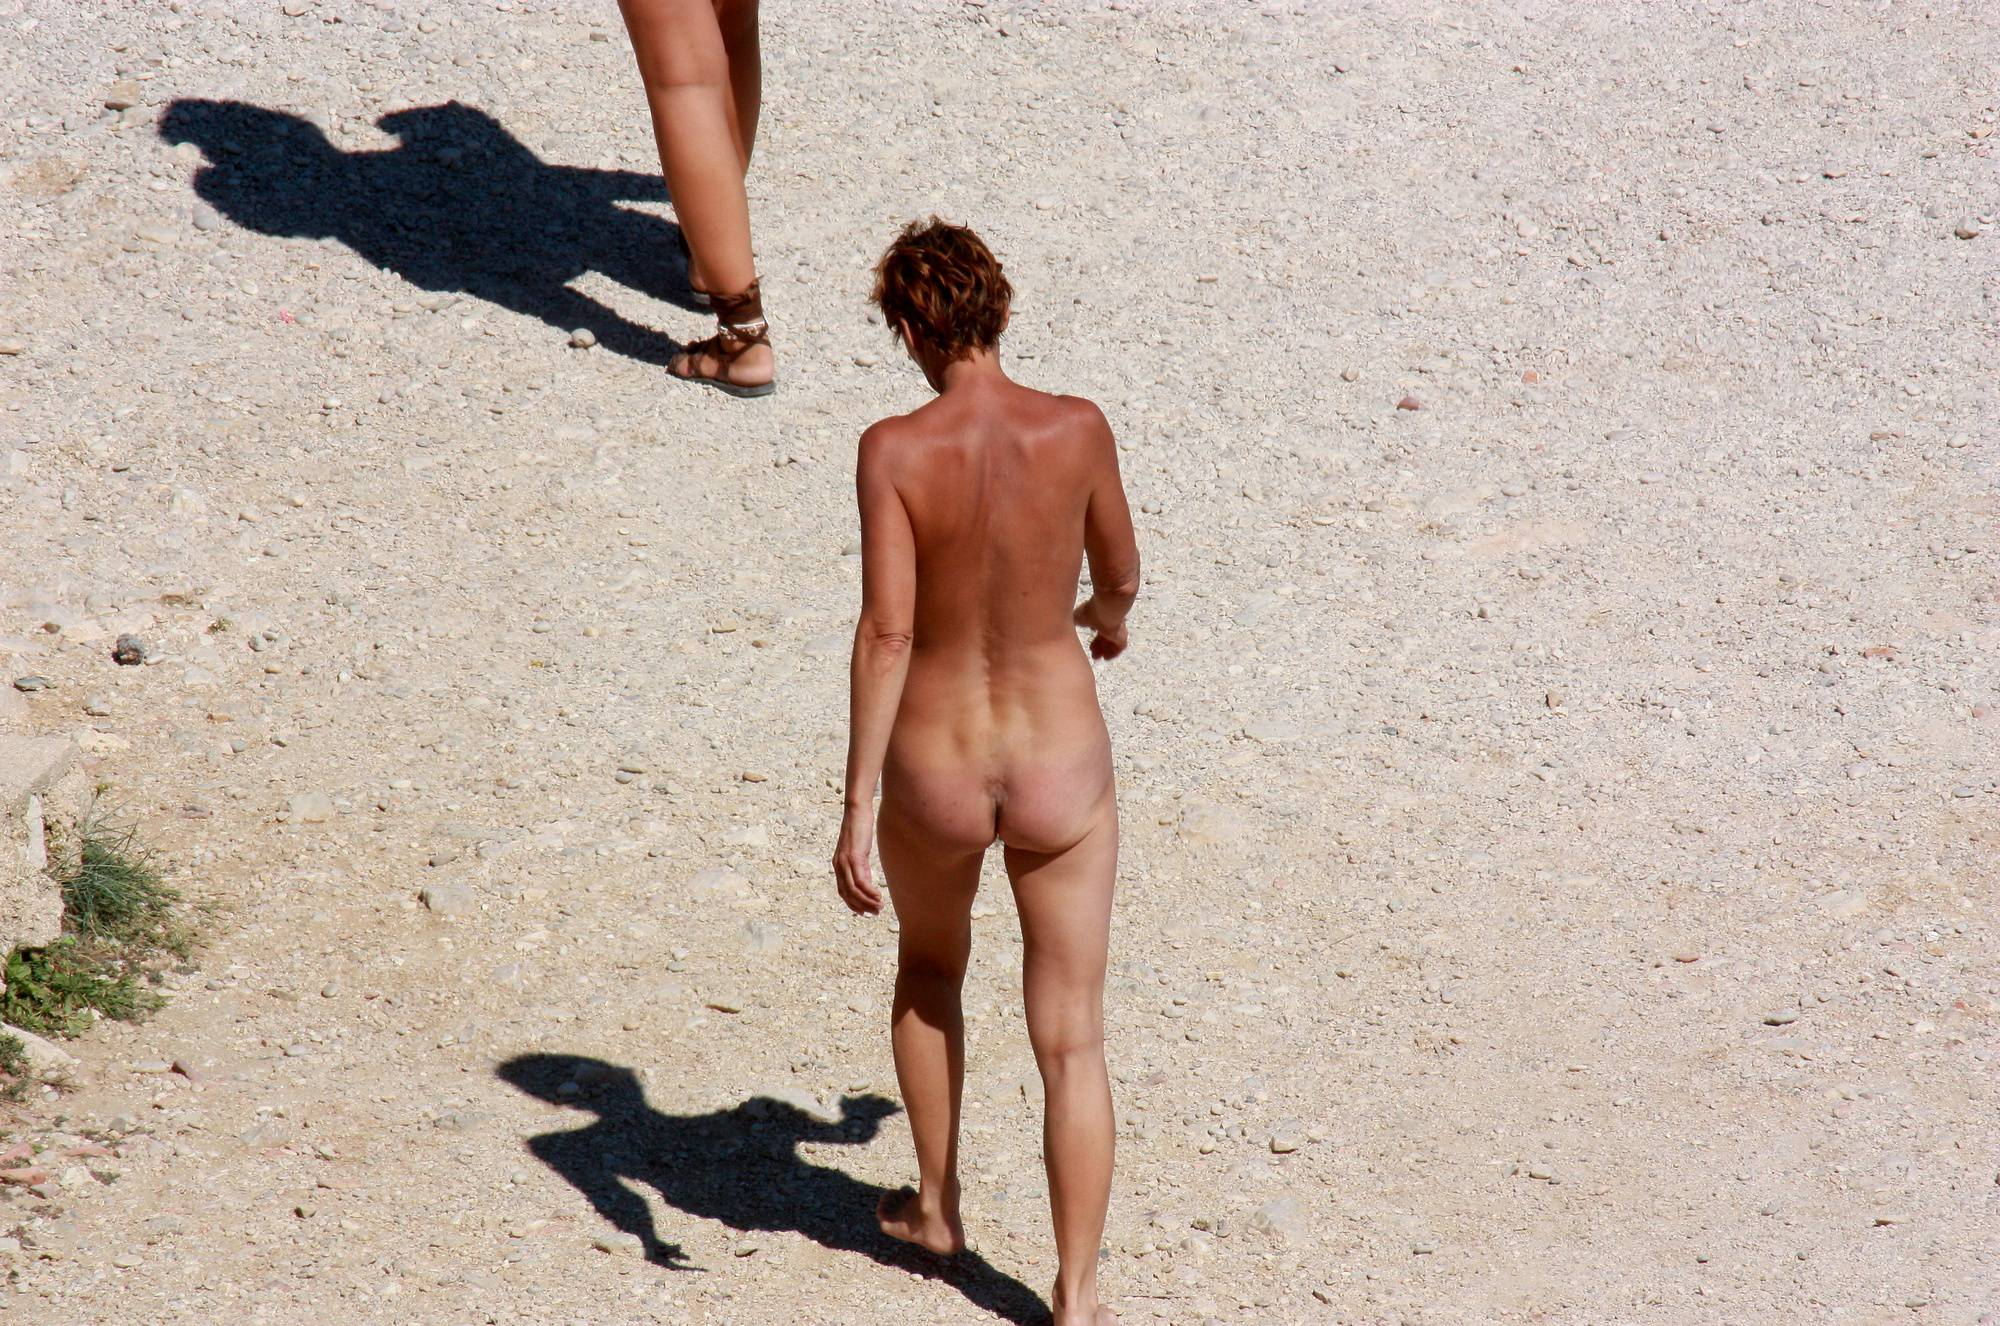 Family Nude Beach Voyage - 1